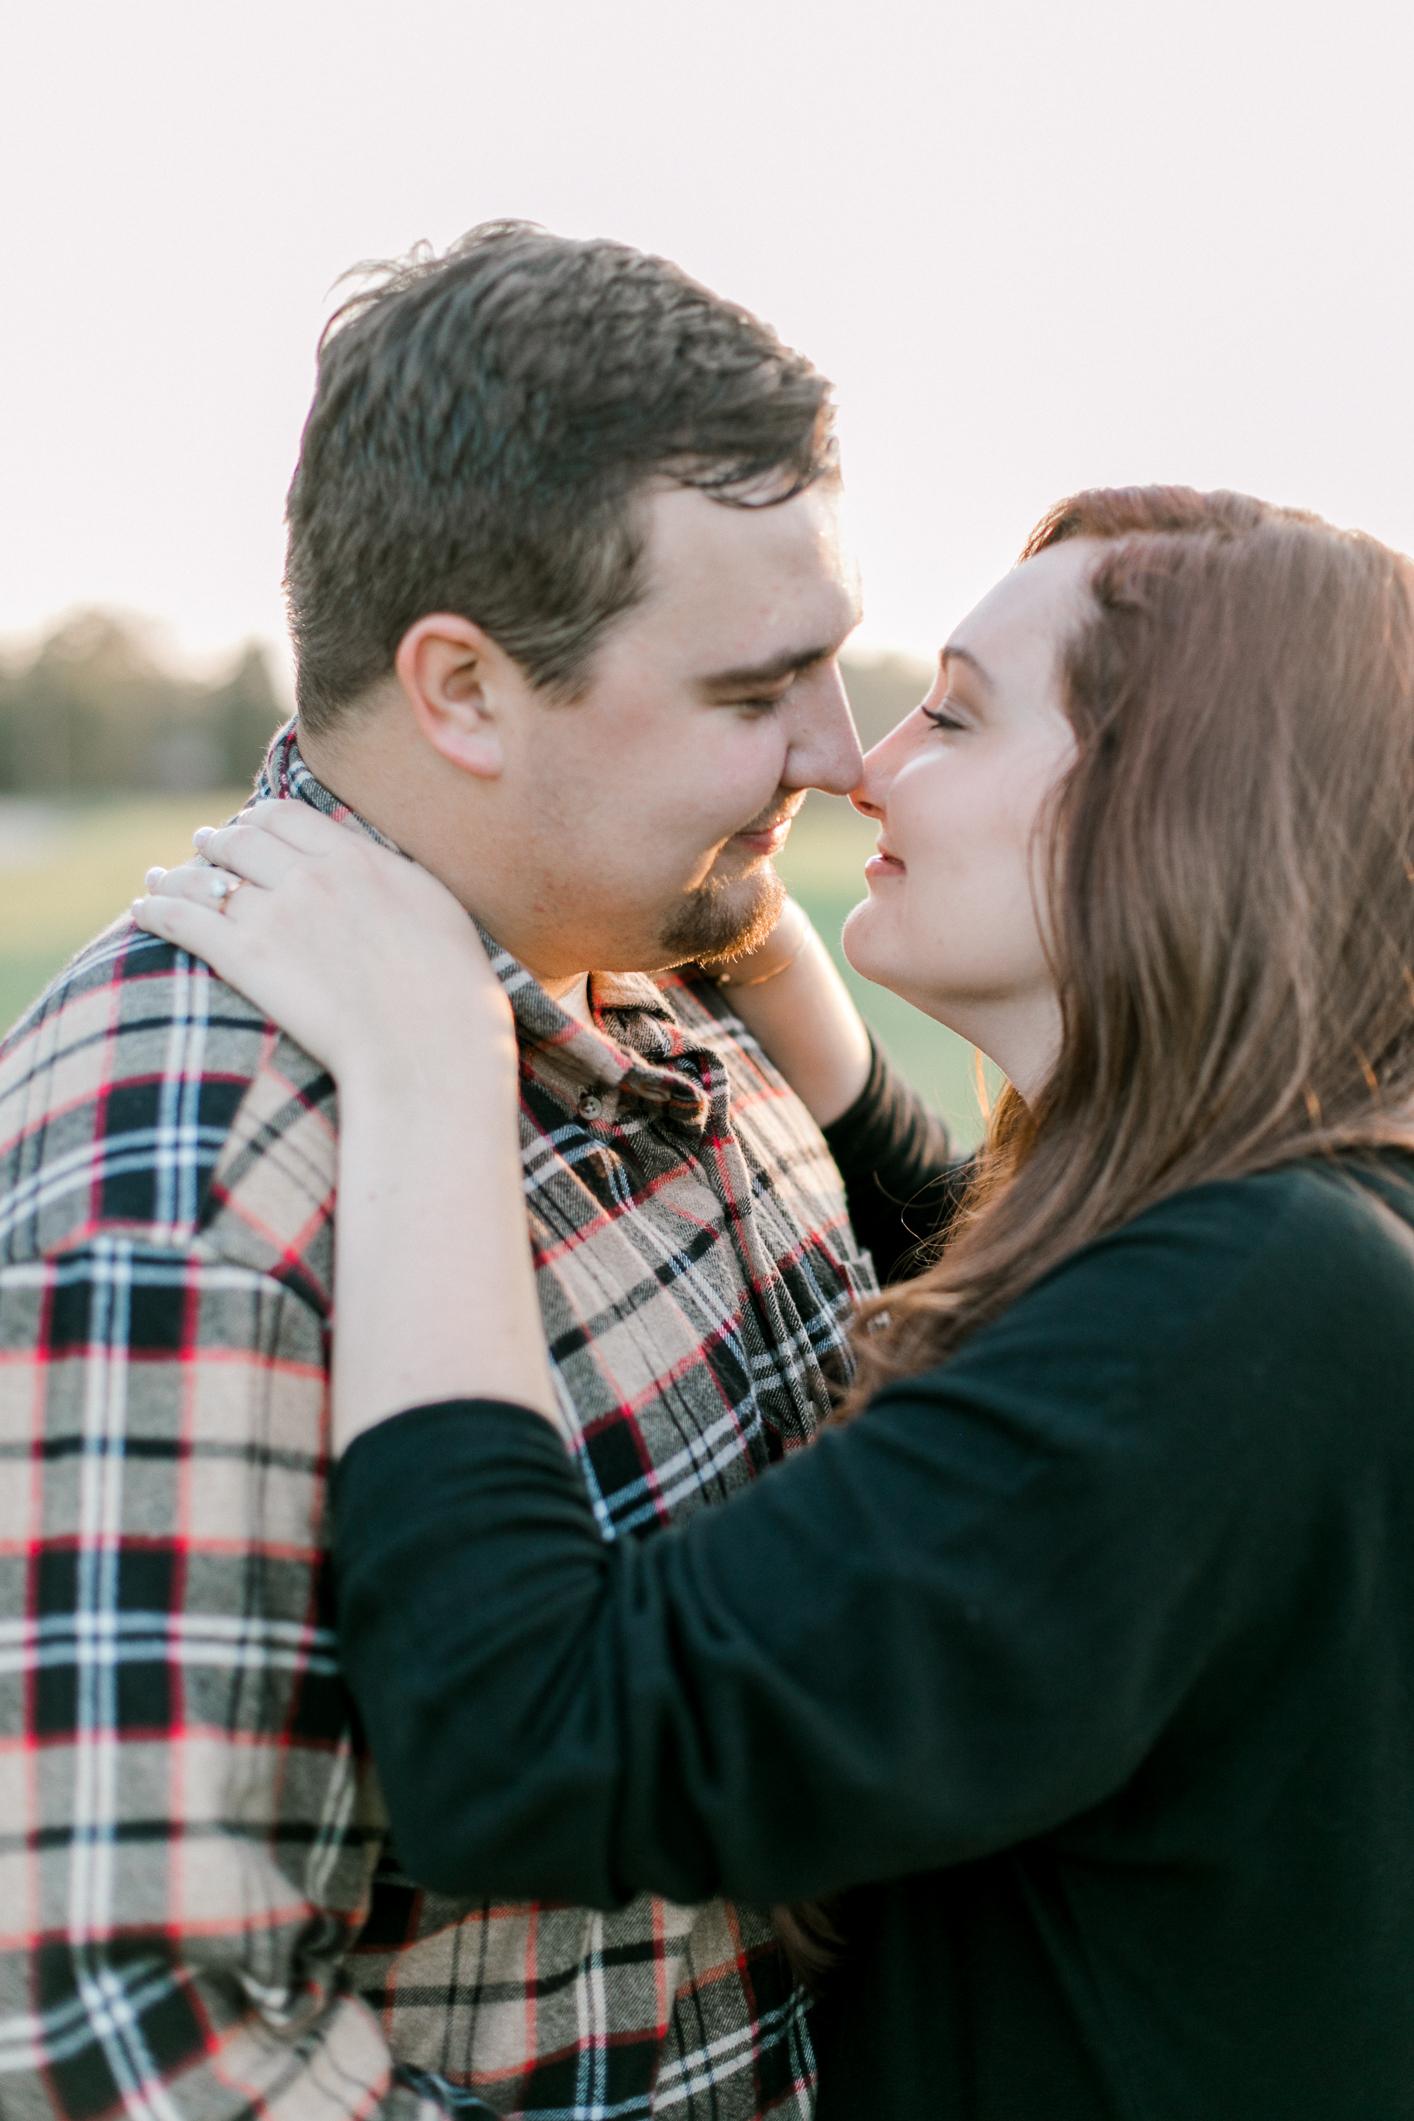 North Carolina Engagement Photographer Danielle Gallo Photography.jpg